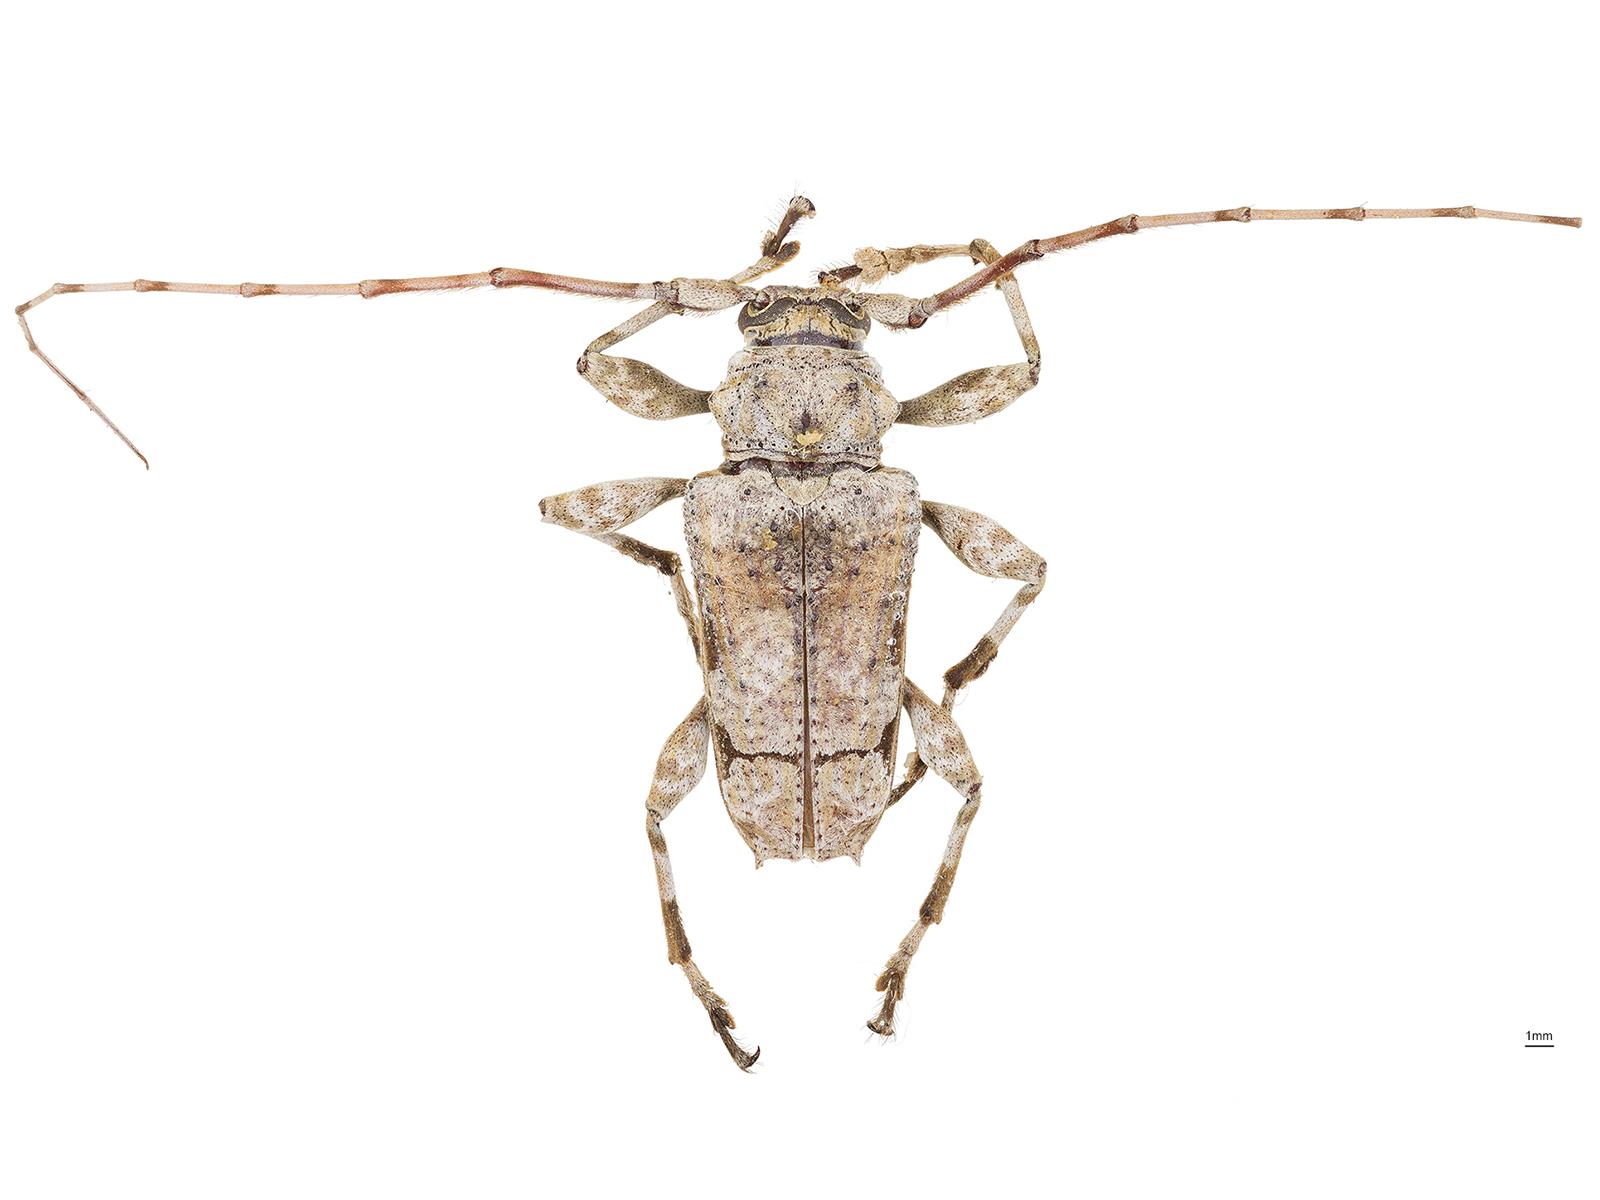 Oreodera glauca(Linnaeus, 1758)